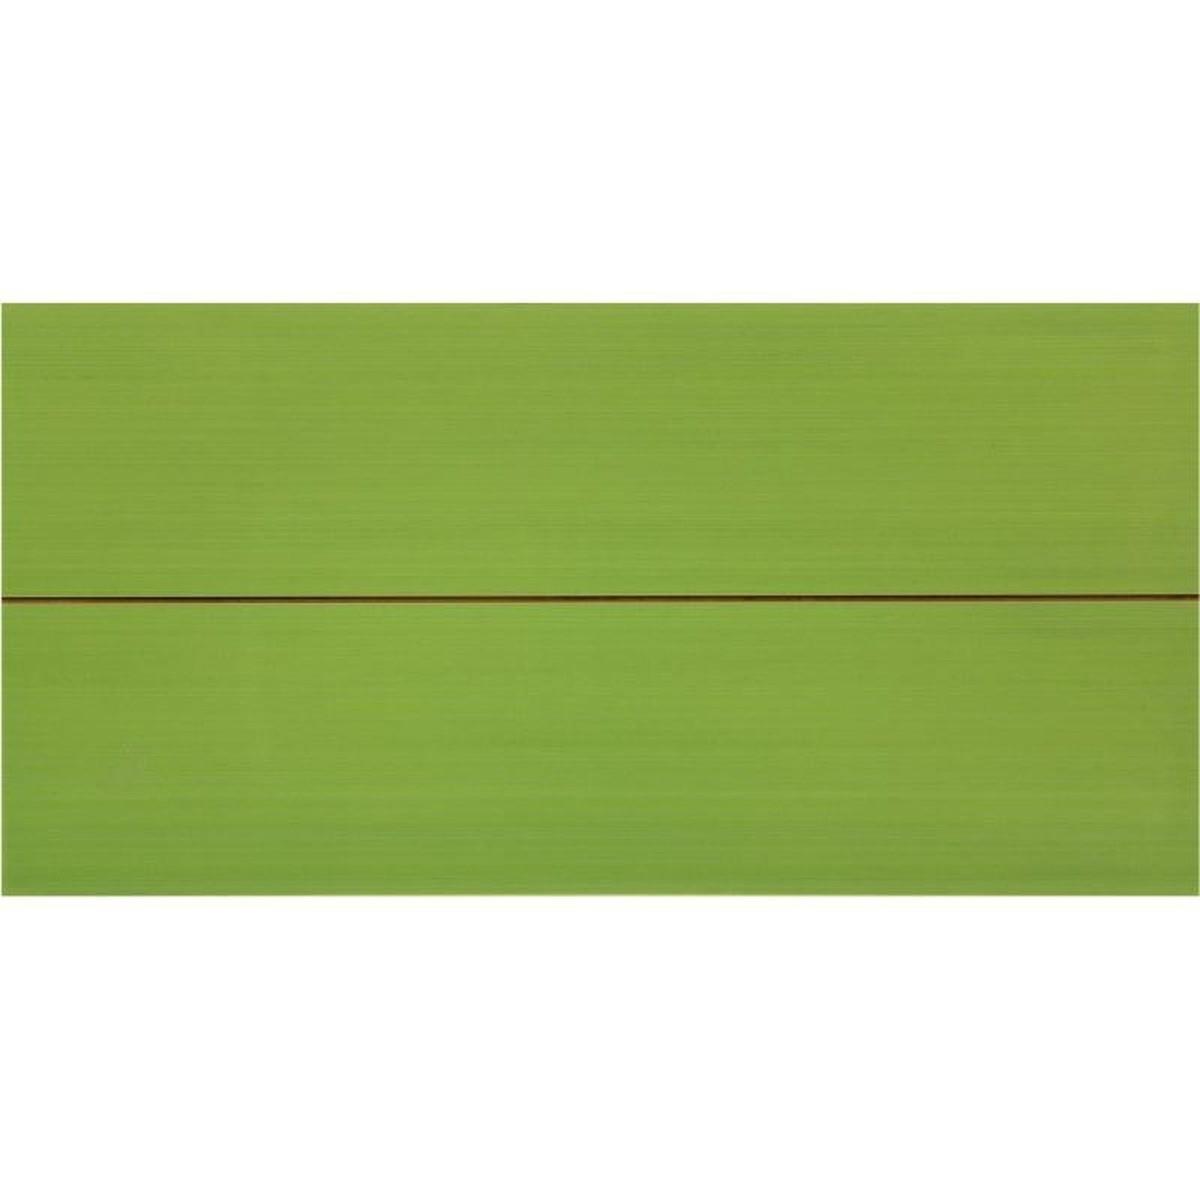 Вставка Фрэска 2 20х40 см цвет салатный